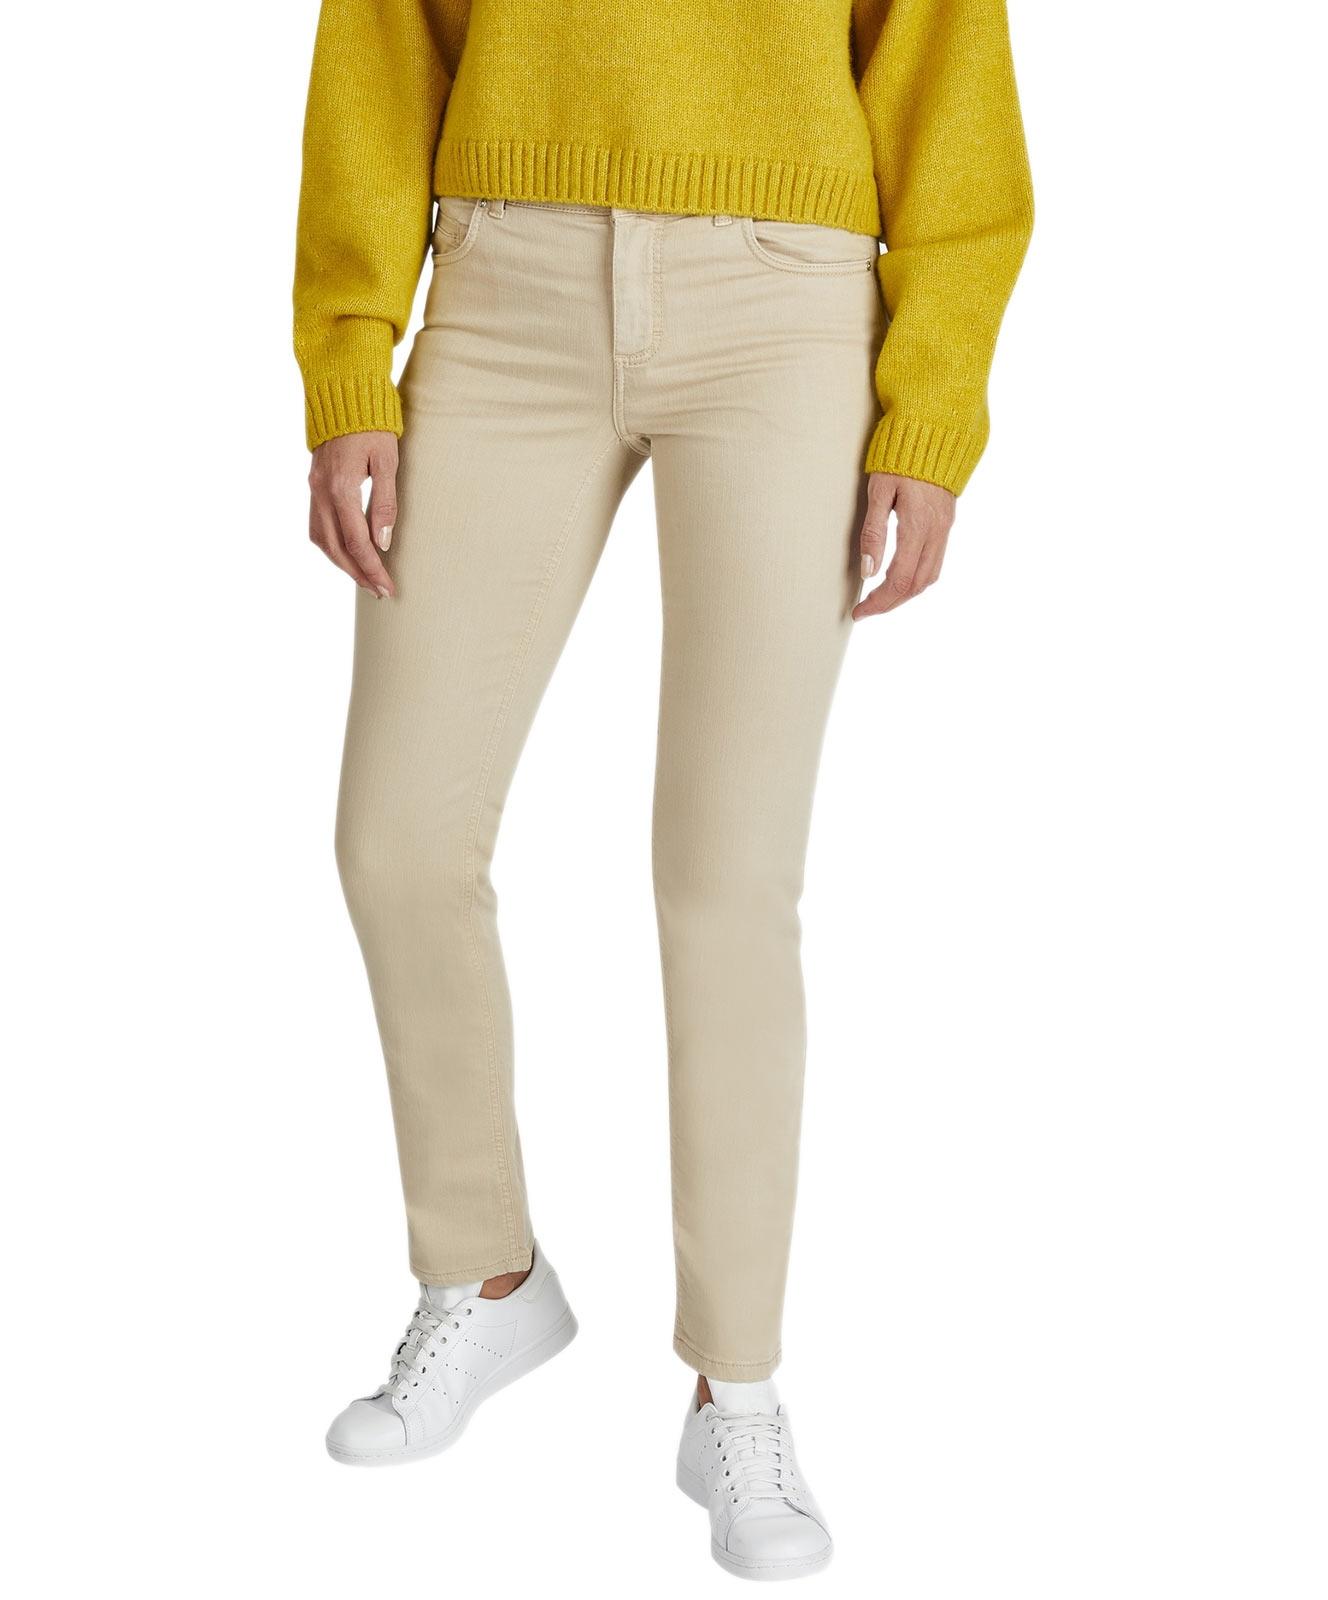 Hosen - Angels Straight Leg Jeans Cici in Latte  - Onlineshop Jeans Meile